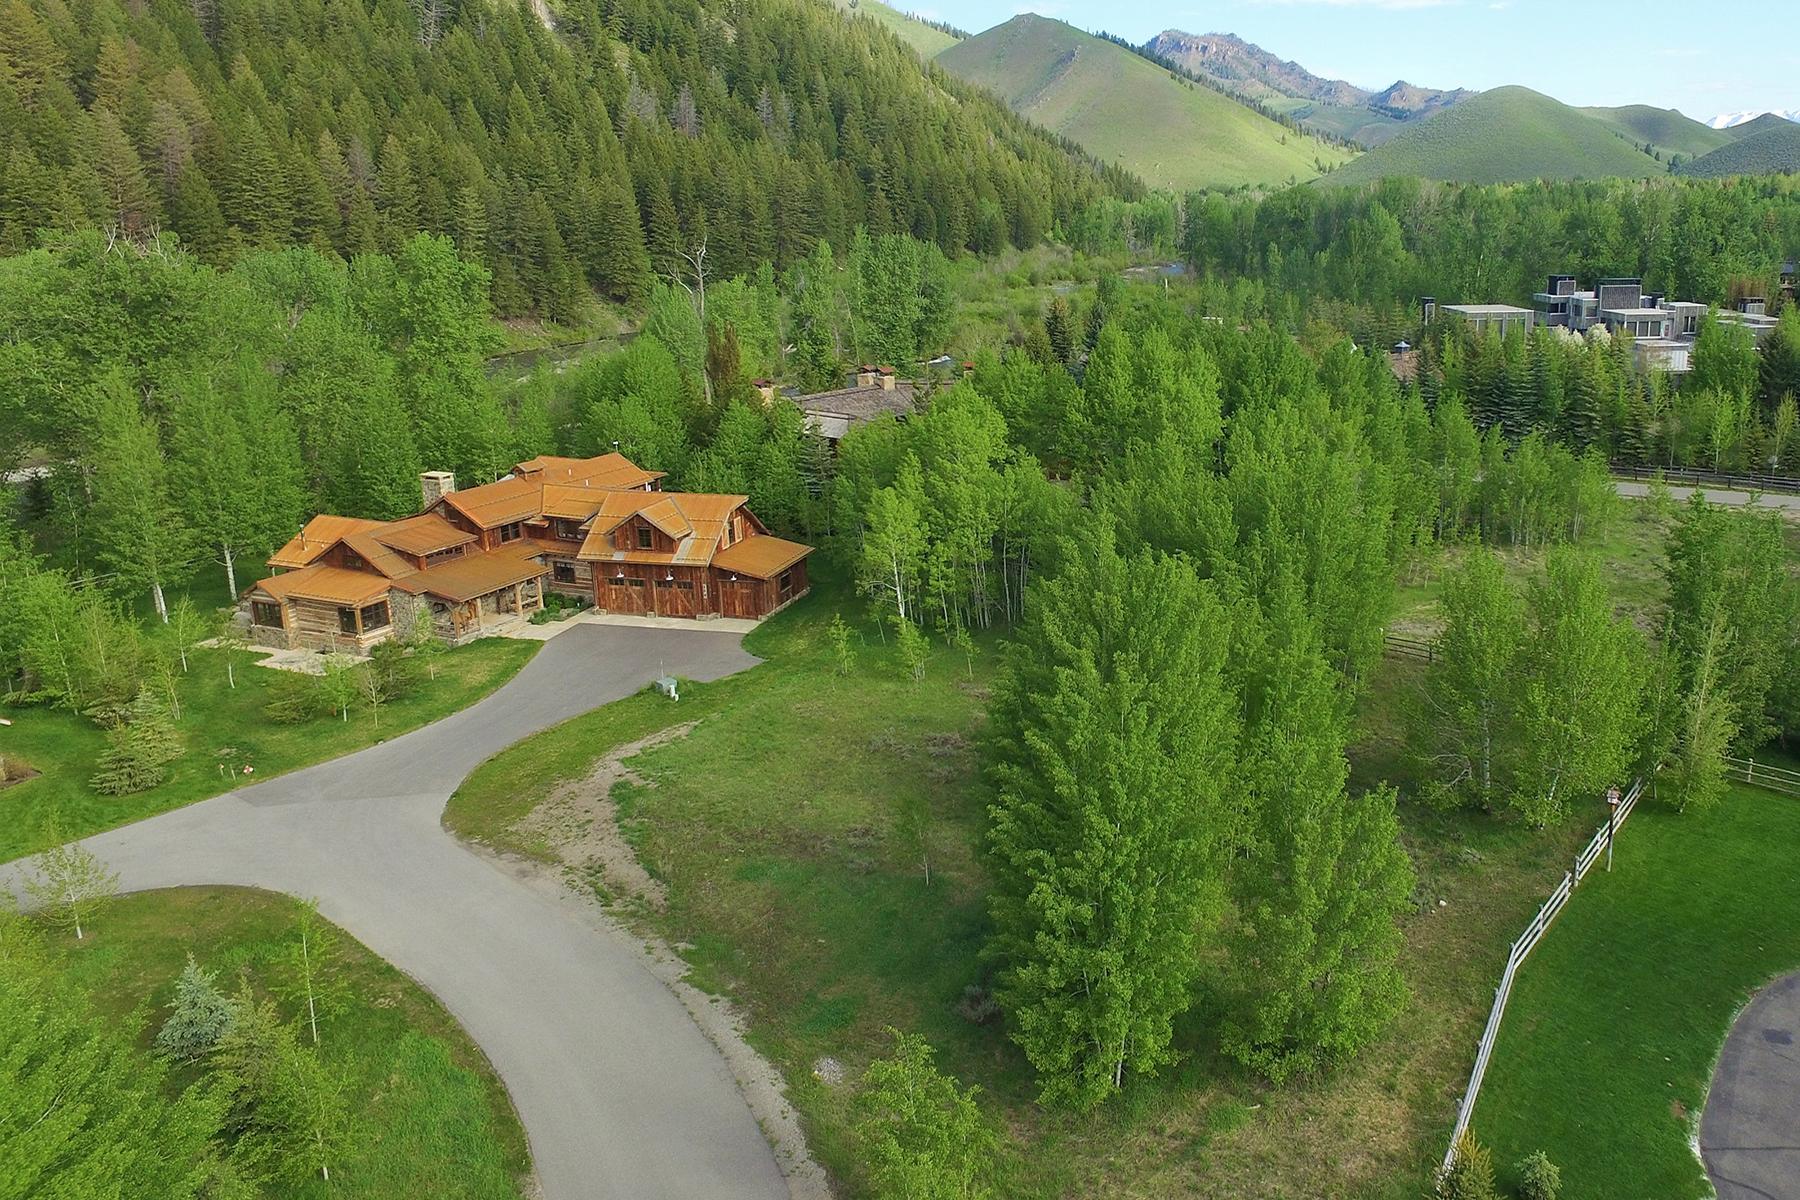 Land for Sale at Rocking Ranch 104 Wood River Dr N Lot 5 Ketchum, Idaho 83340 United States